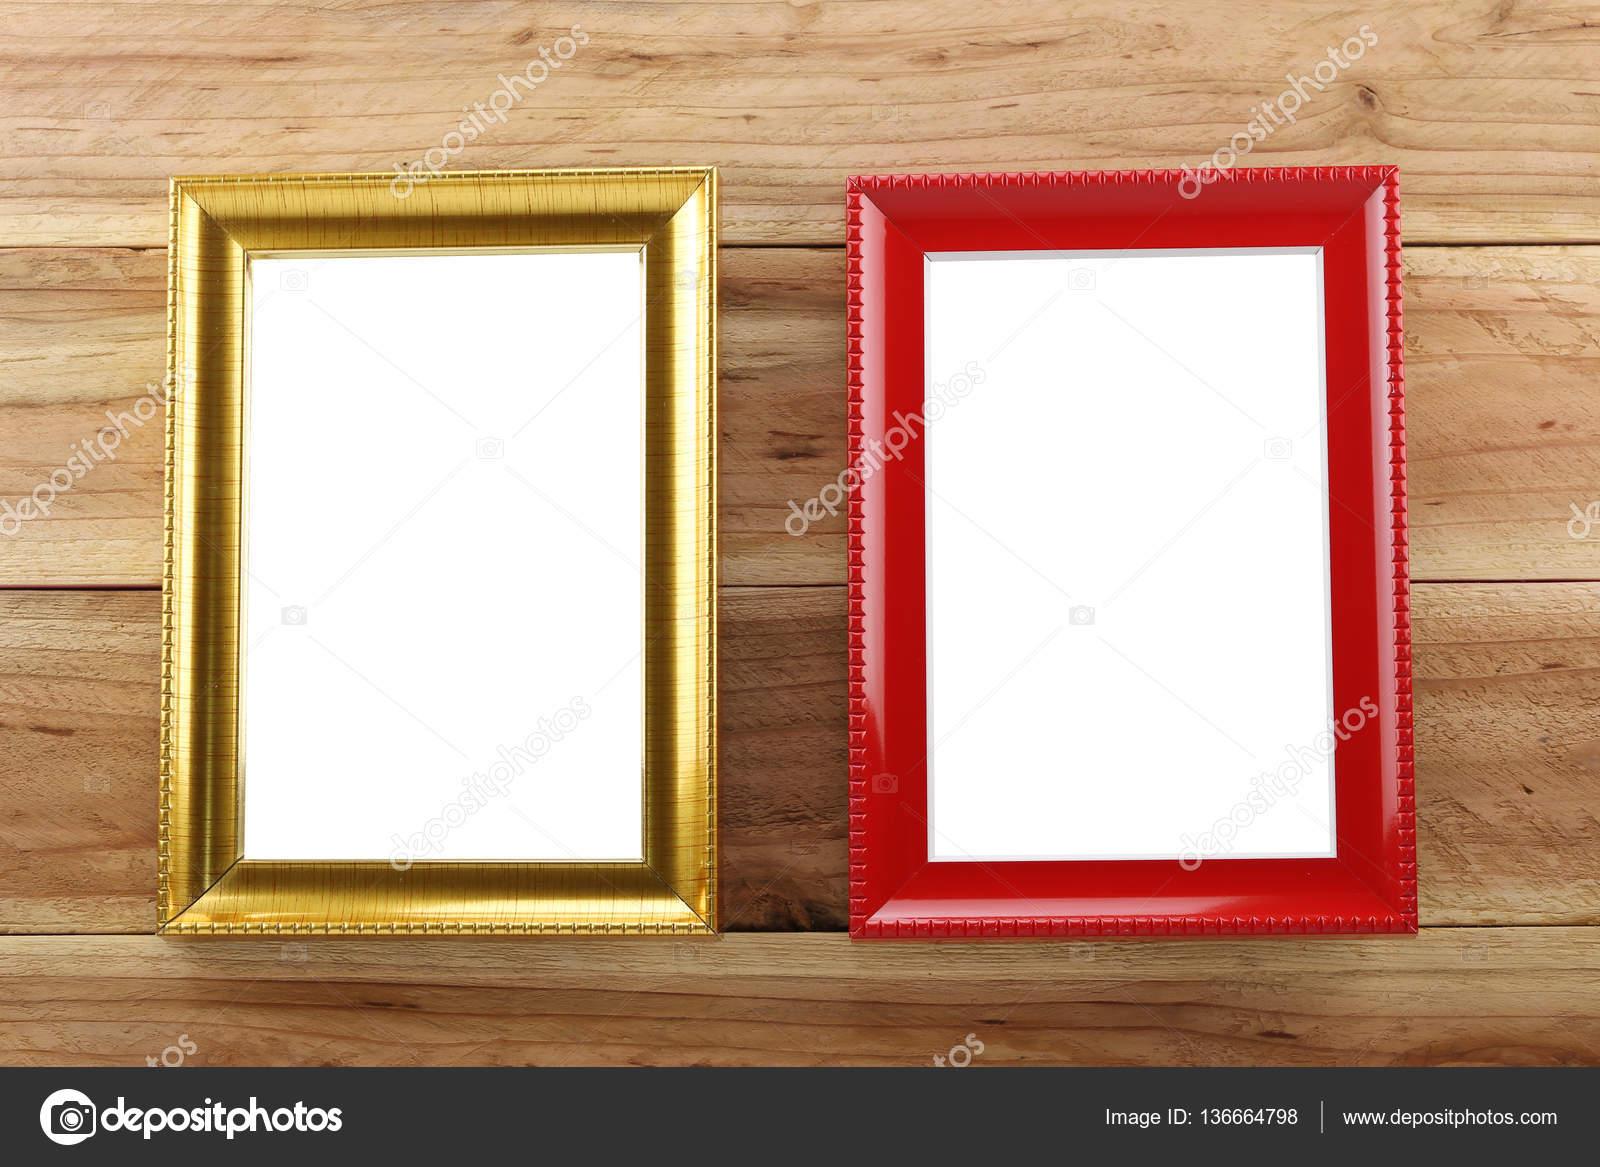 Vintage Fotorahmen Holz Hintergrund — Stockfoto © meepoohyaphoto ...